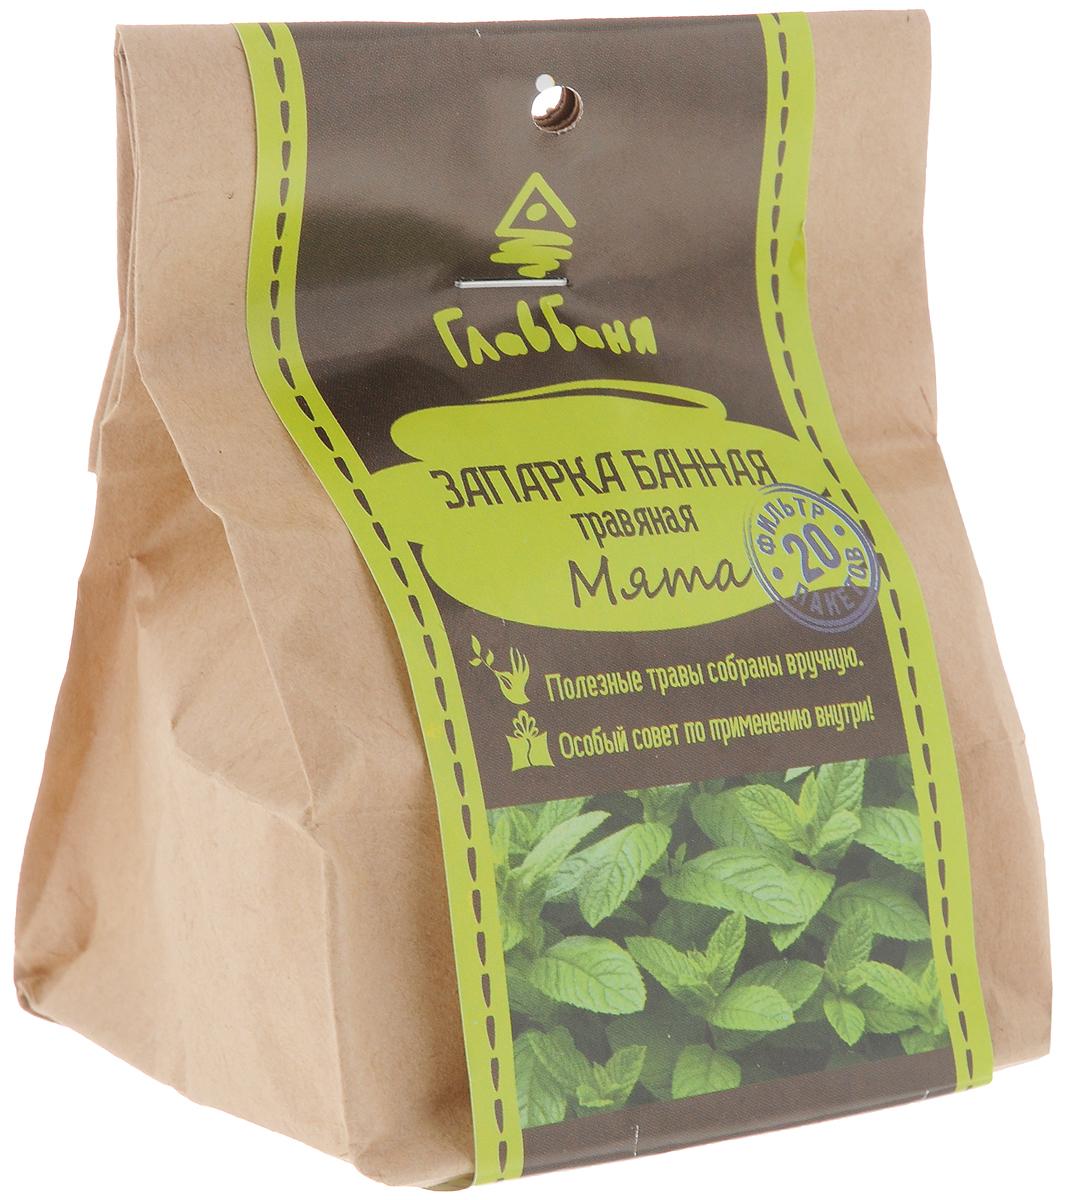 Запарка для бани и сауны Главбаня Мята, 20 фильтр-пакетиков камни для бани harvia